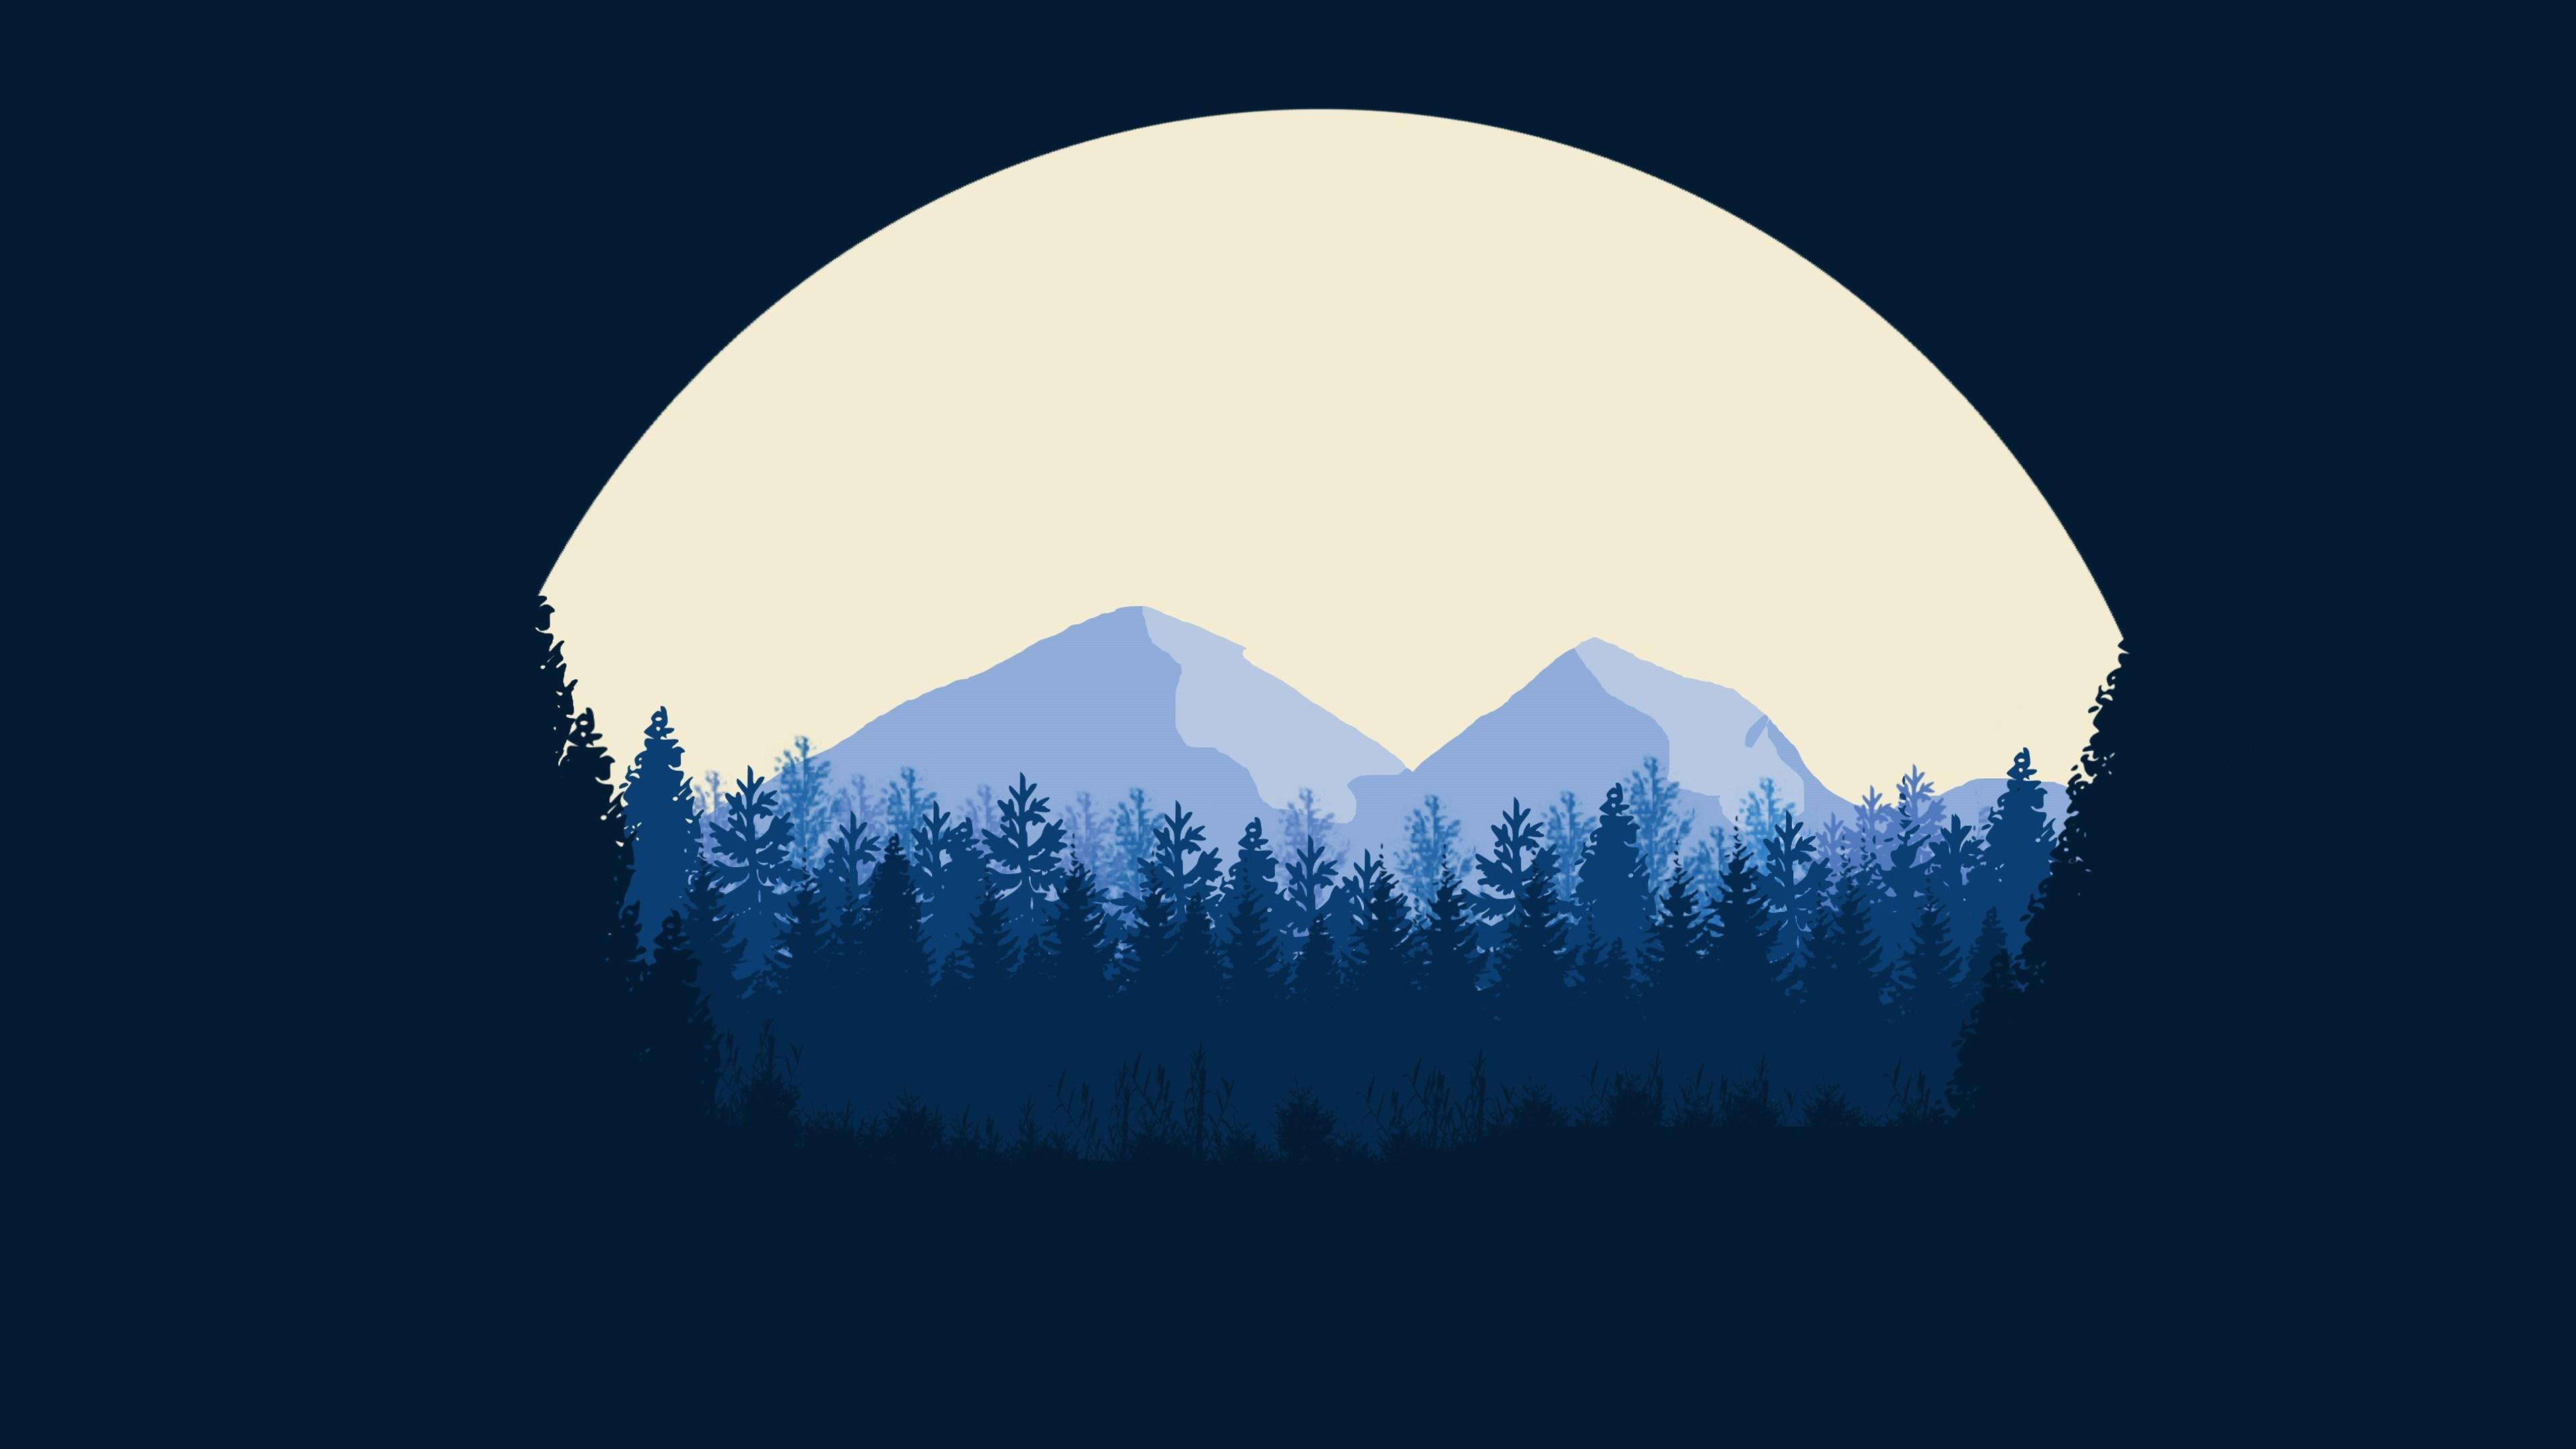 Recovery Mountain Minimalist 4k Hd Desktop Wallpaper For: Minimalist Mountains, HD Artist, 4k Wallpapers, Images